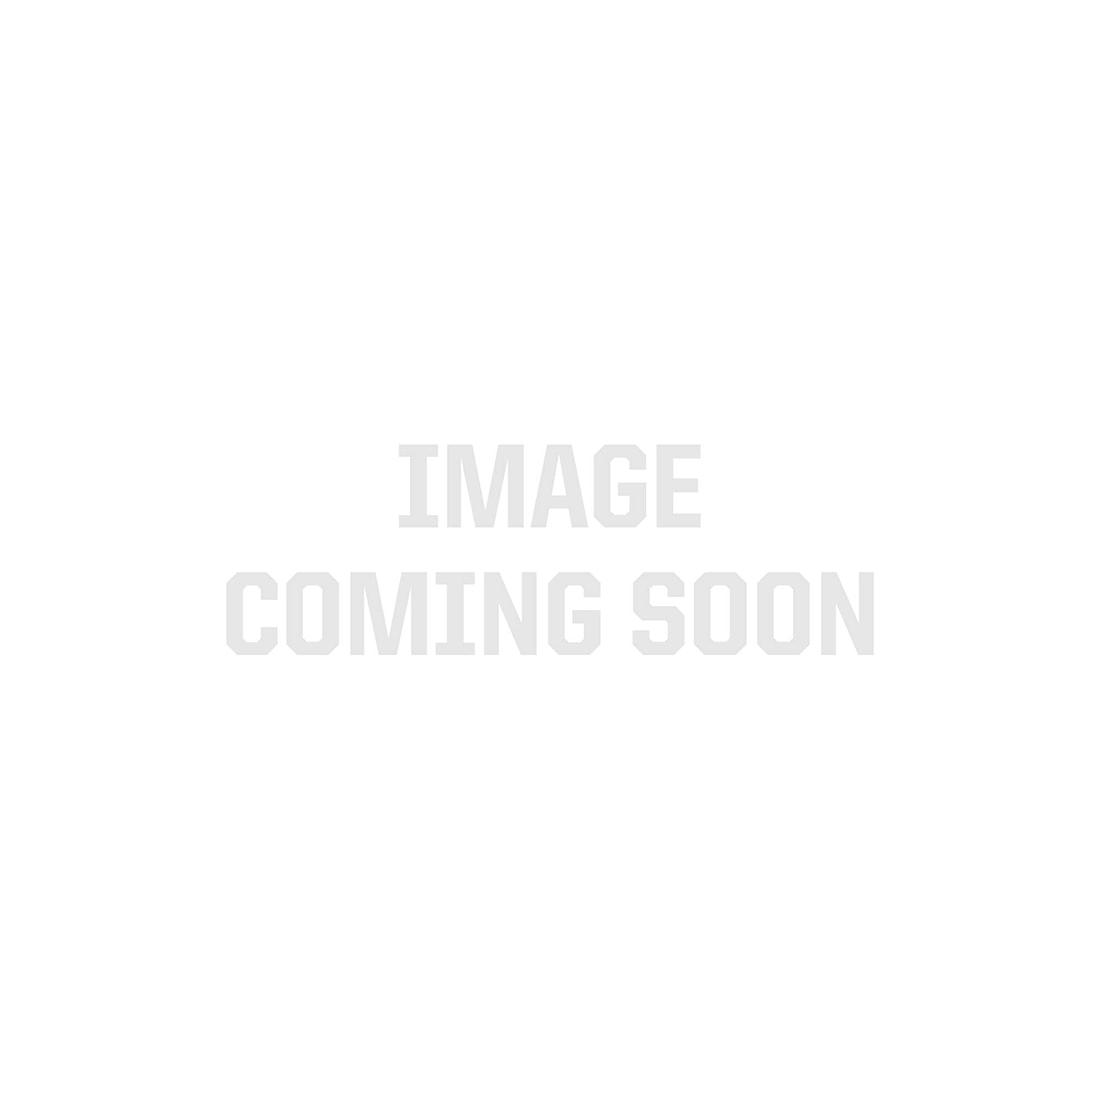 Neutral White 2835 CurrentControl 160 Degree High Power LED Light Bar, 7 LEDs/bar, 9.8 inches long